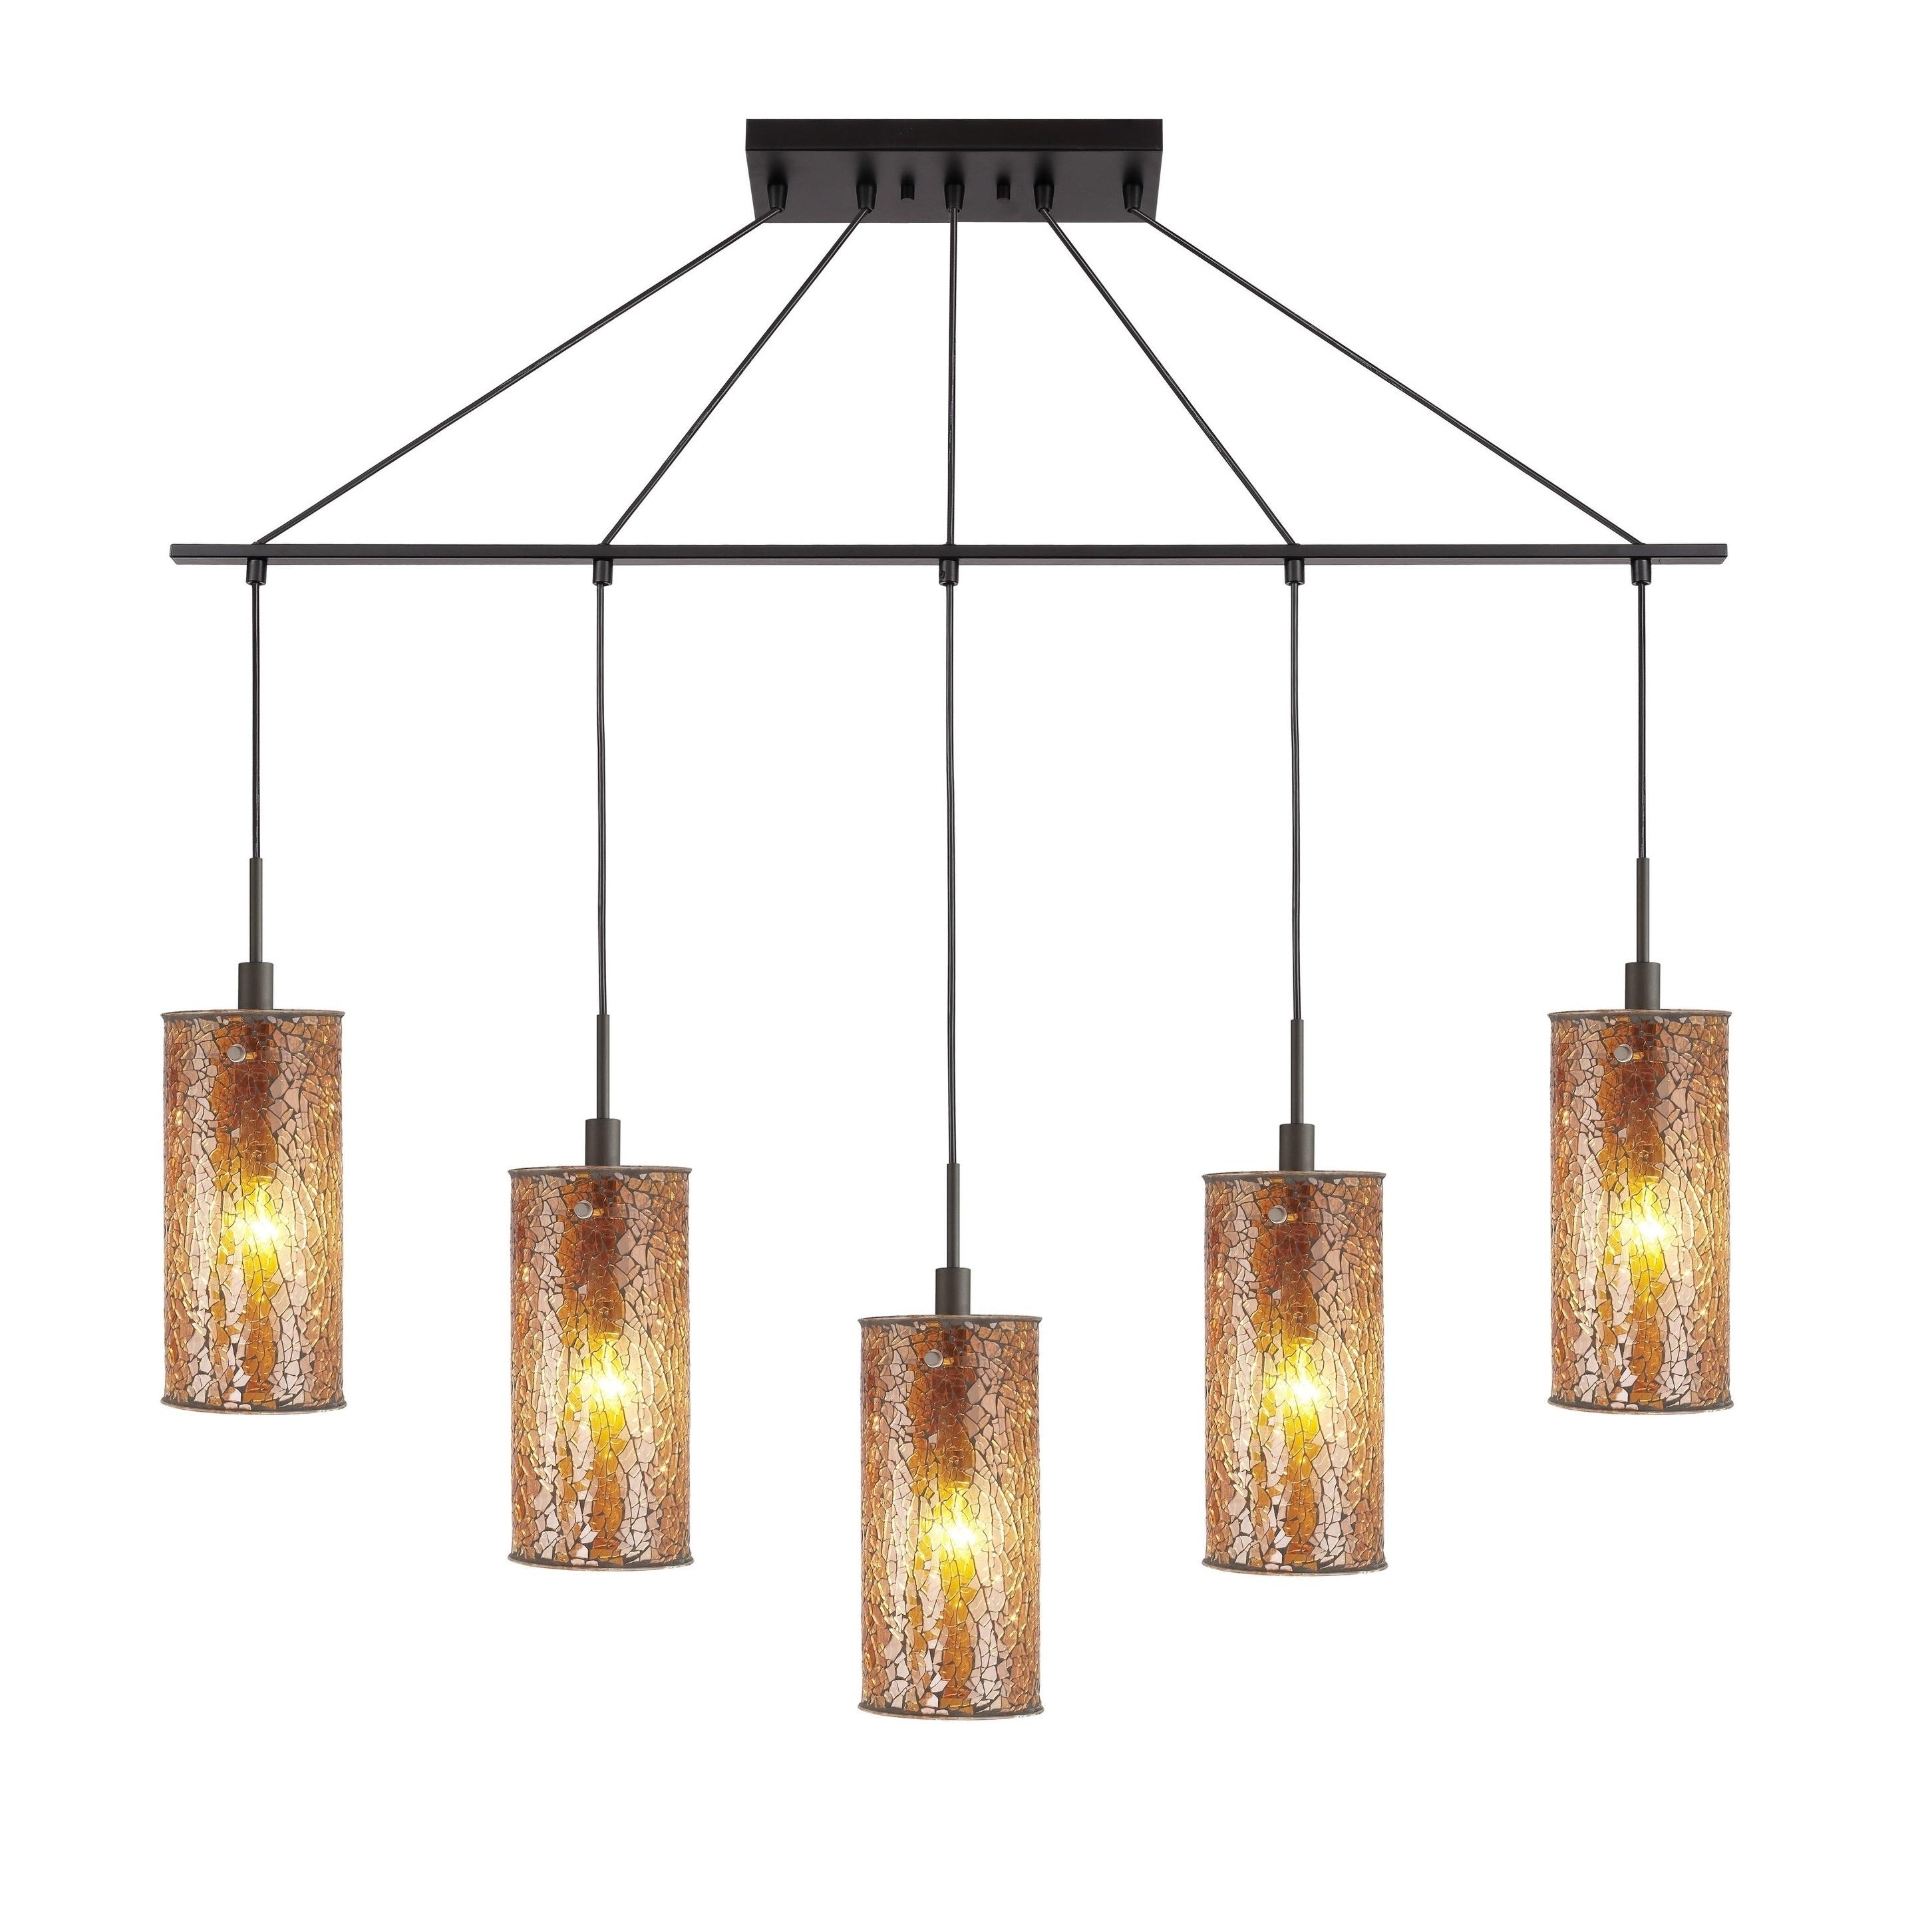 Woodbridge Lighting 13429meb M10 5 Light Linear Pendant